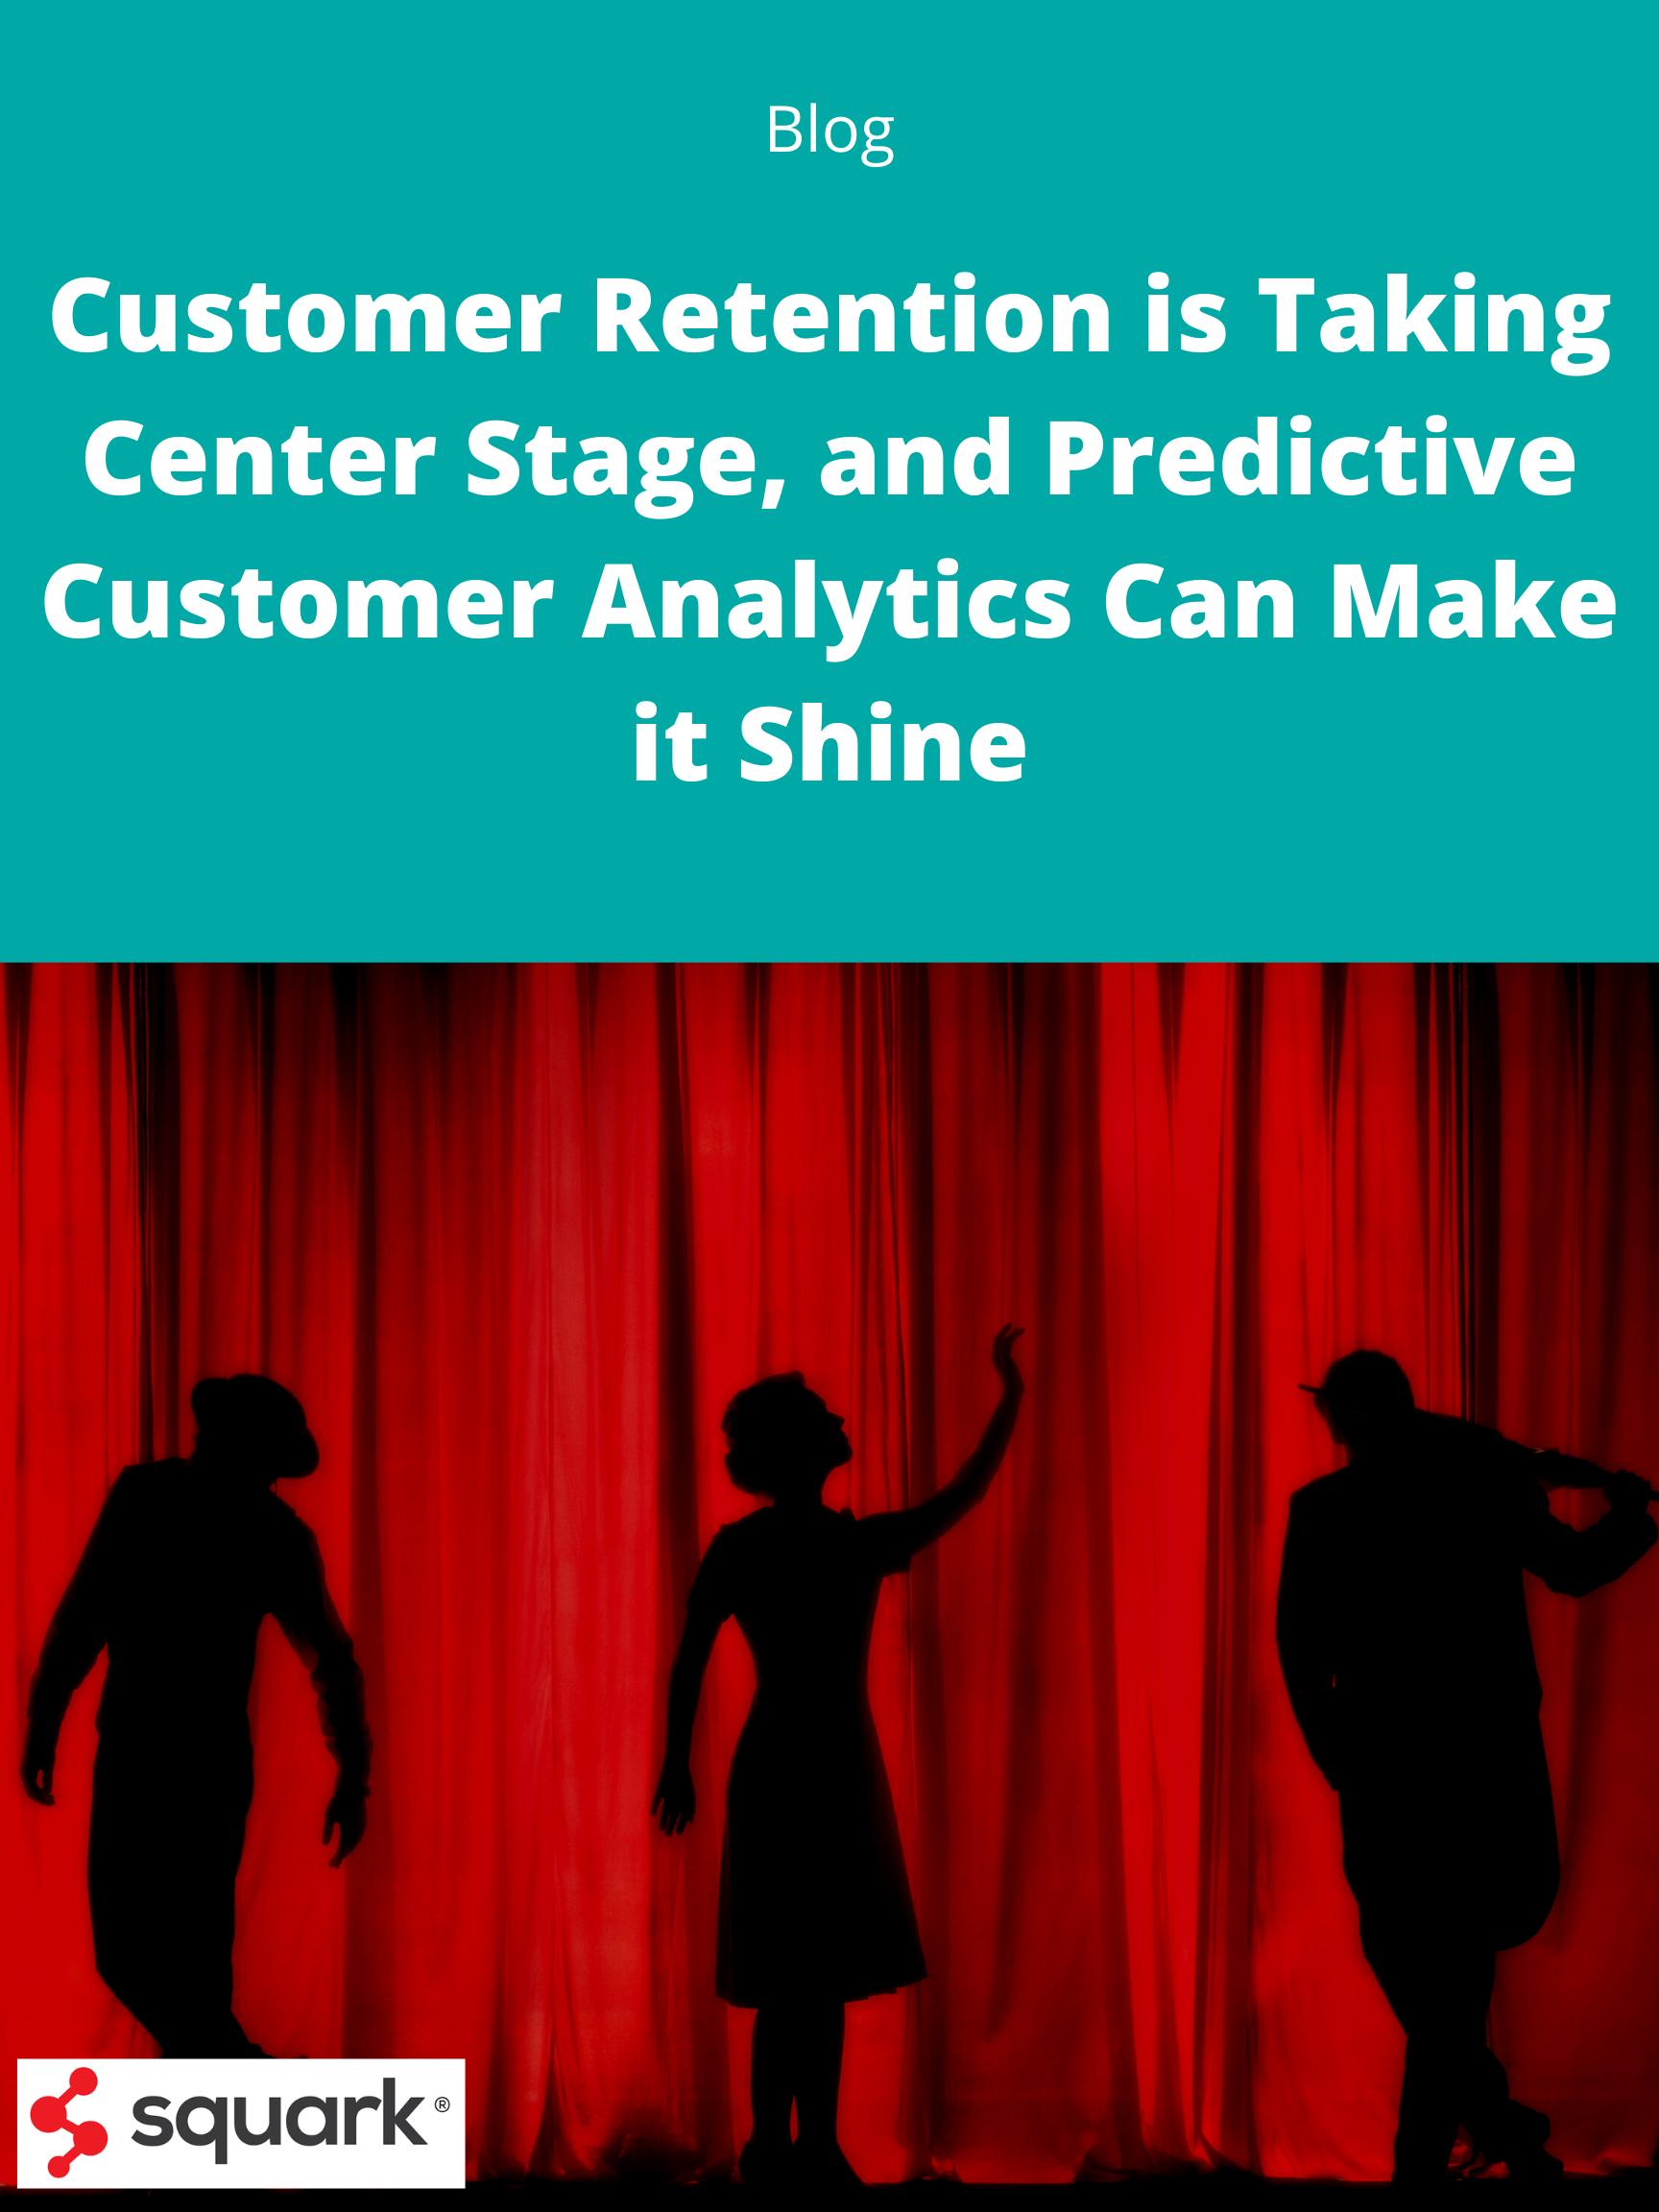 Customer Retention Center Stage...Blog Post Image (1)